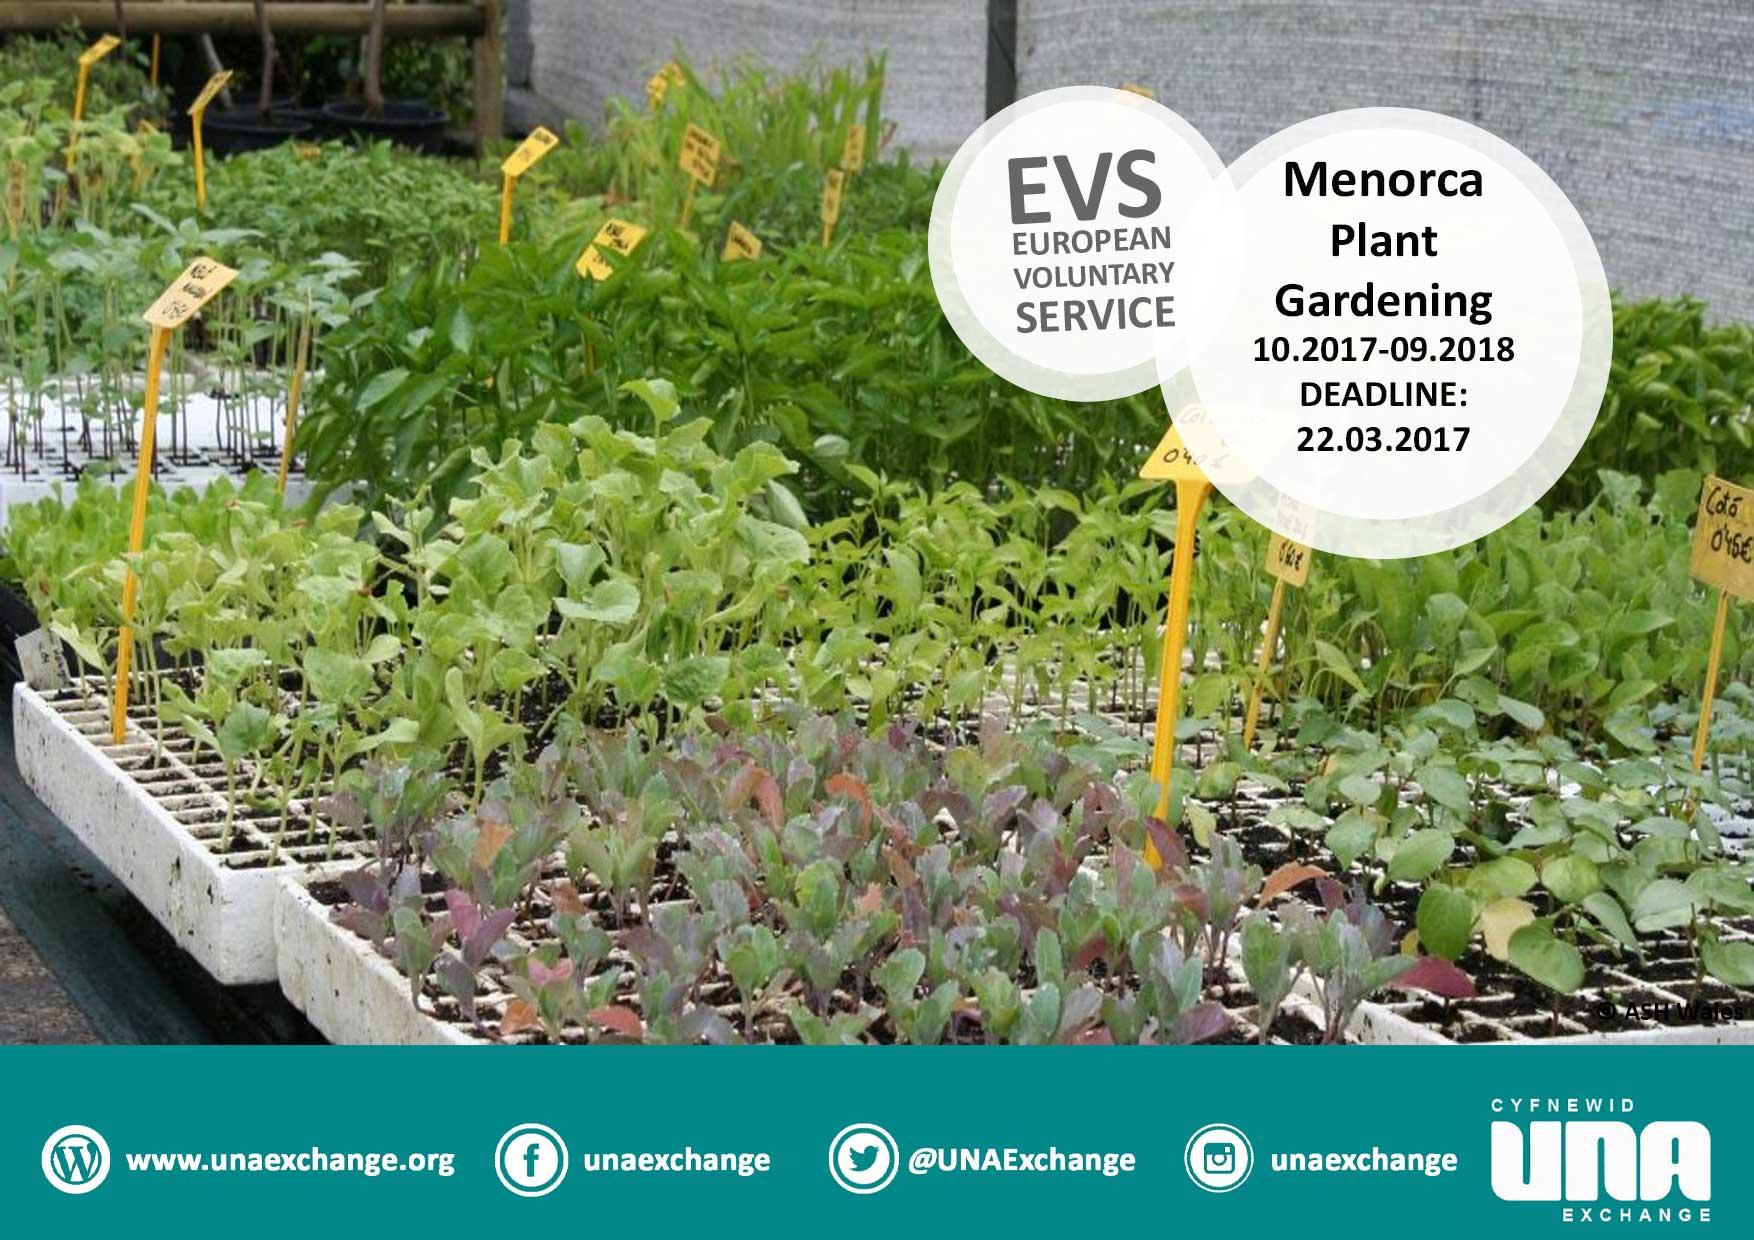 menorca-plant-gardening